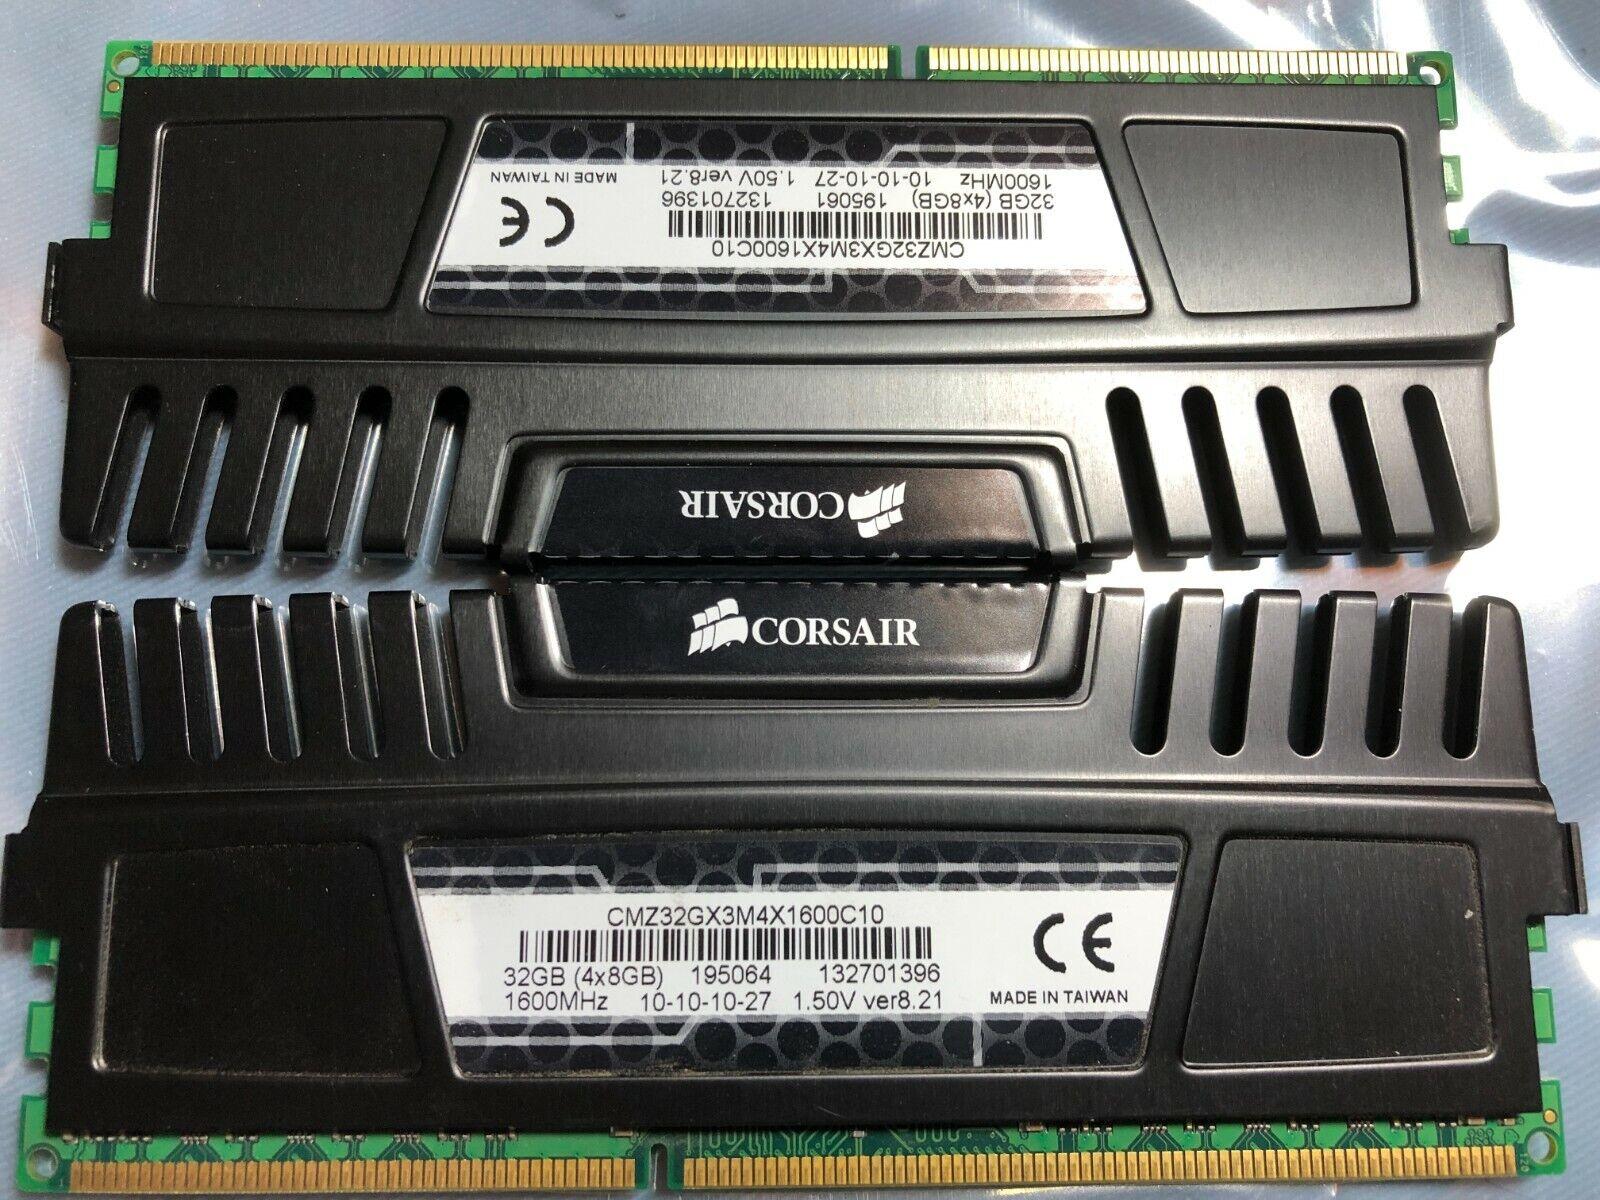 CORSAIR Vengeance 32GB (4 x 8GB) 1600MHz DDR3 SDRAM (CMZ32GX3M4X1600C10). Buy it now for 118.00